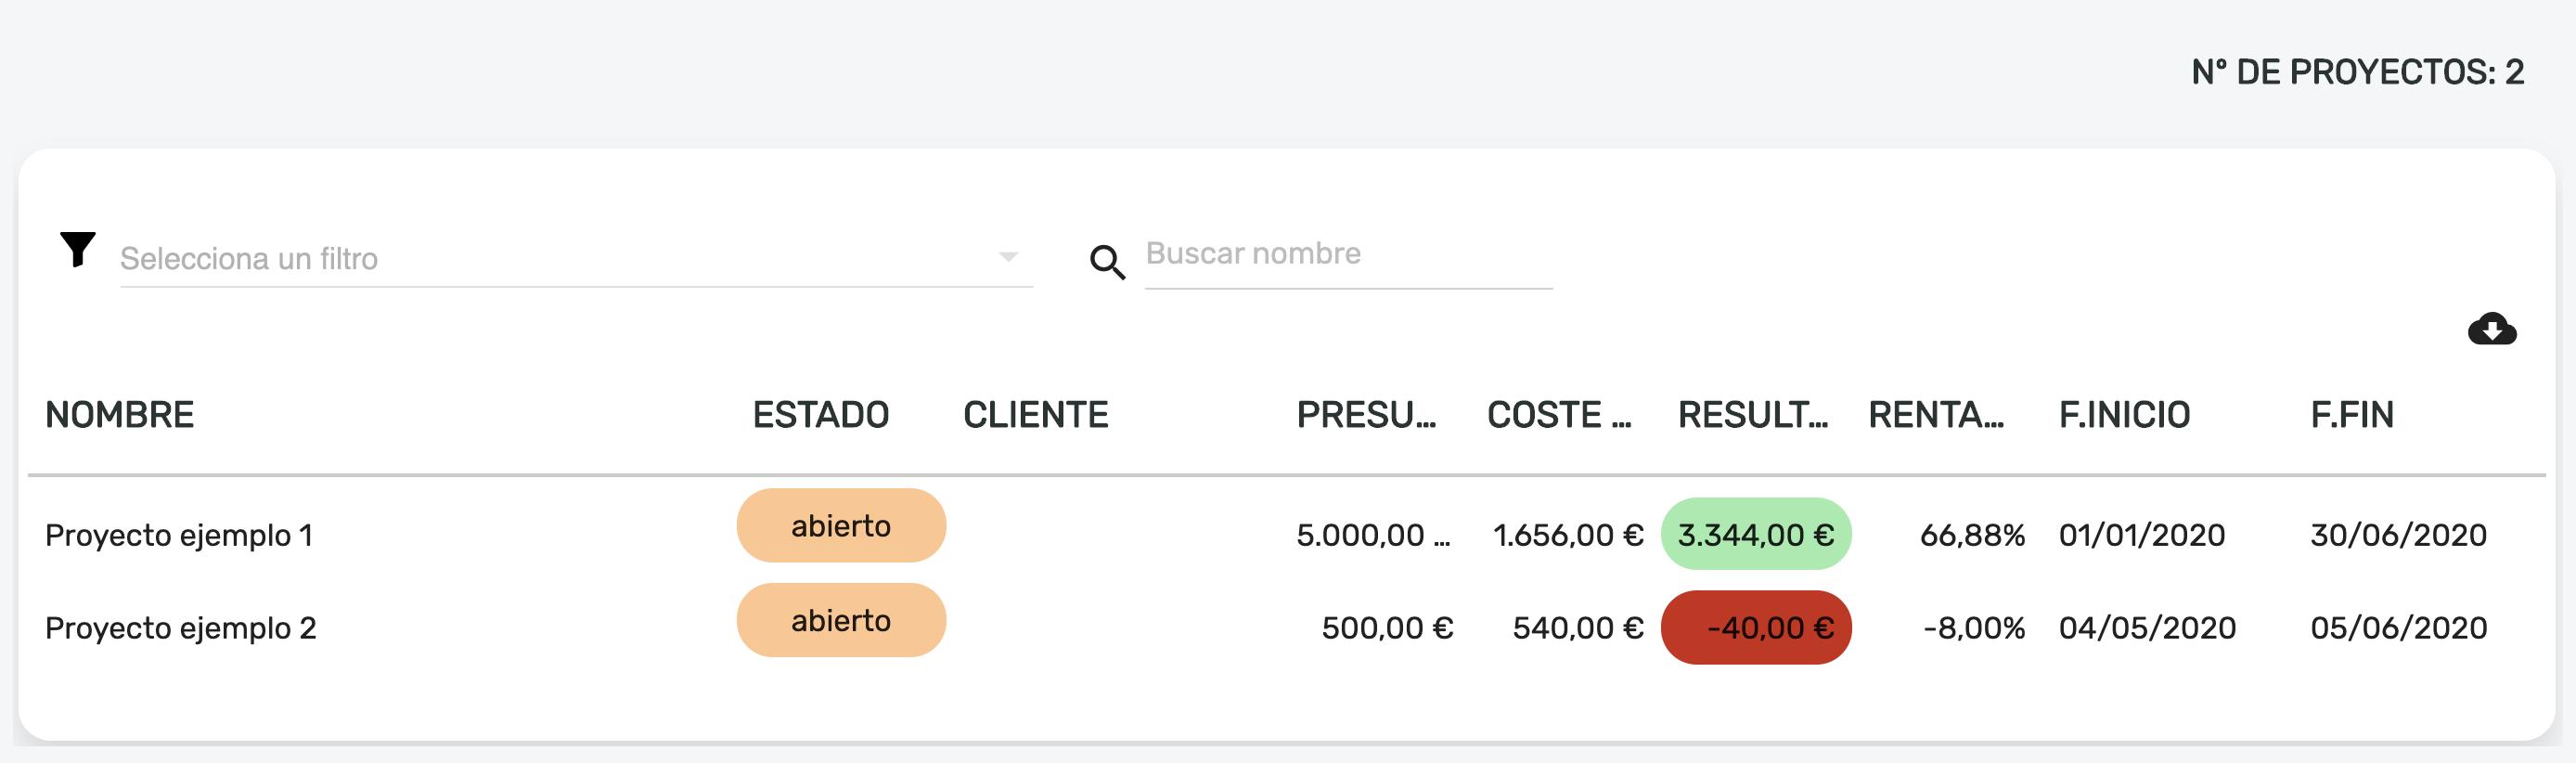 info-rentabilidad.png